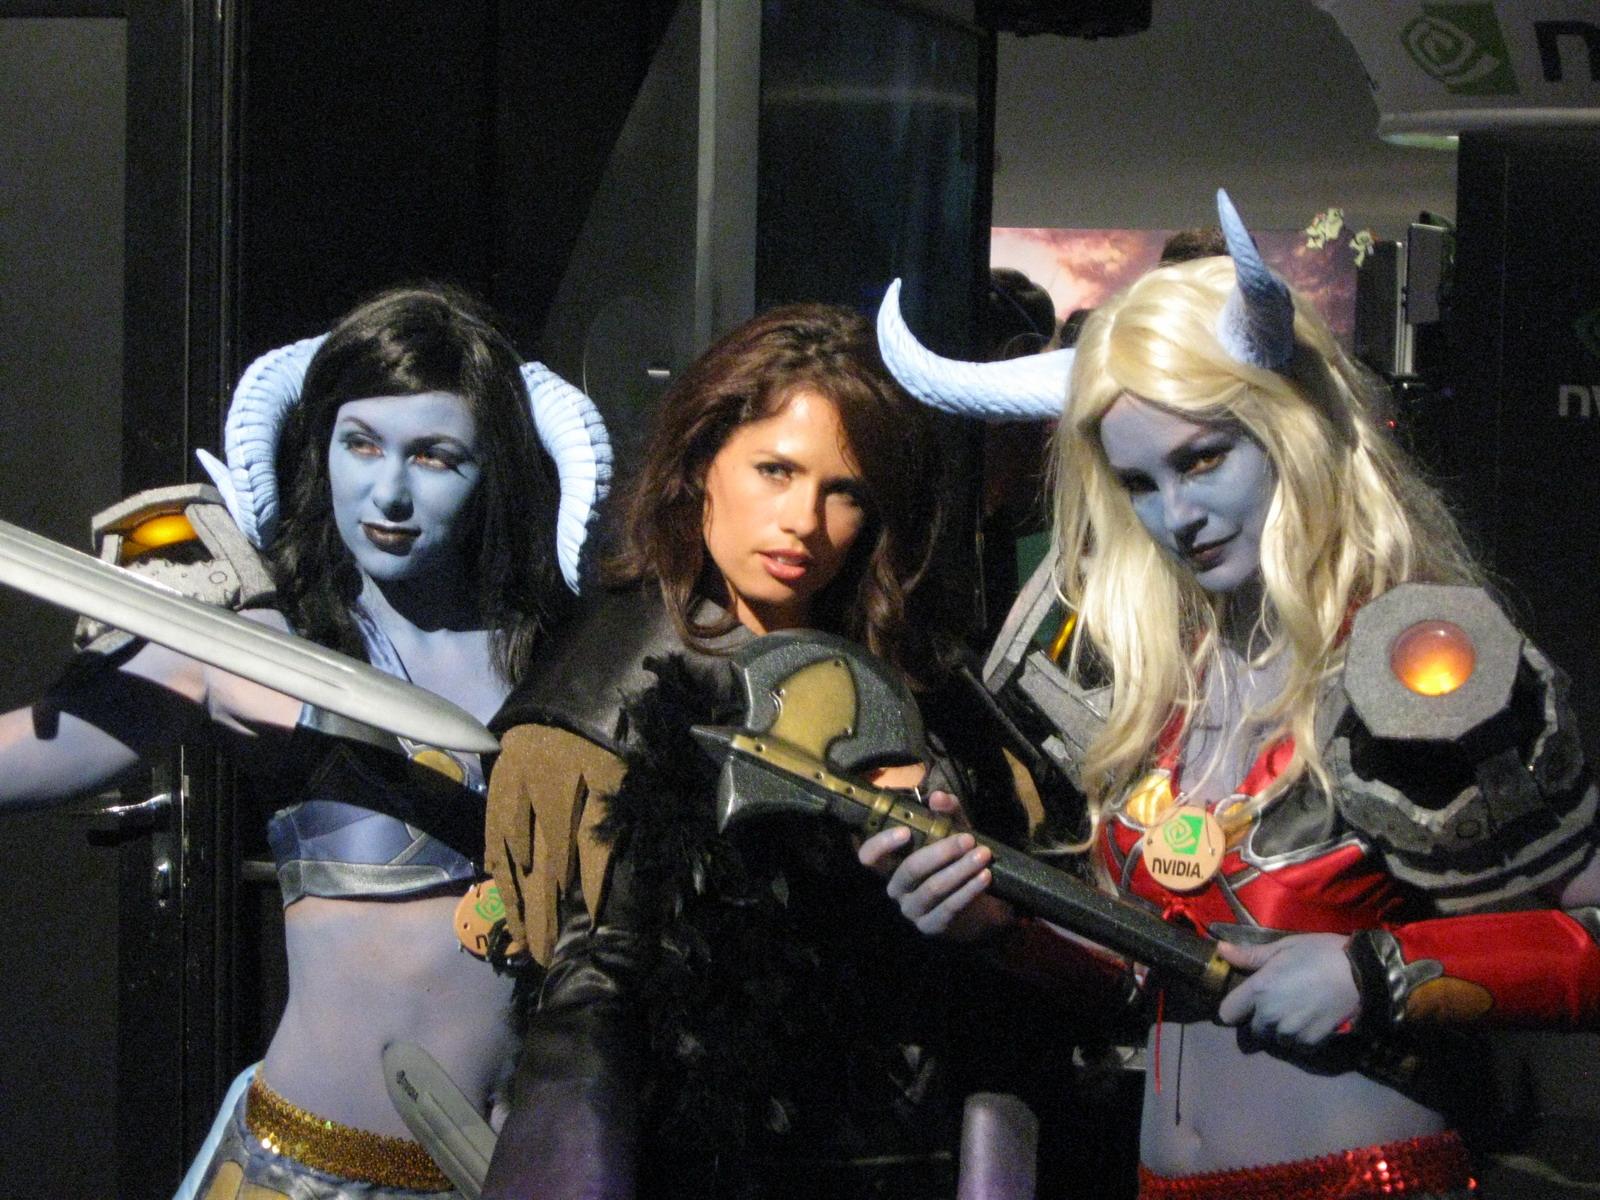 Sexy trio cosplay girls